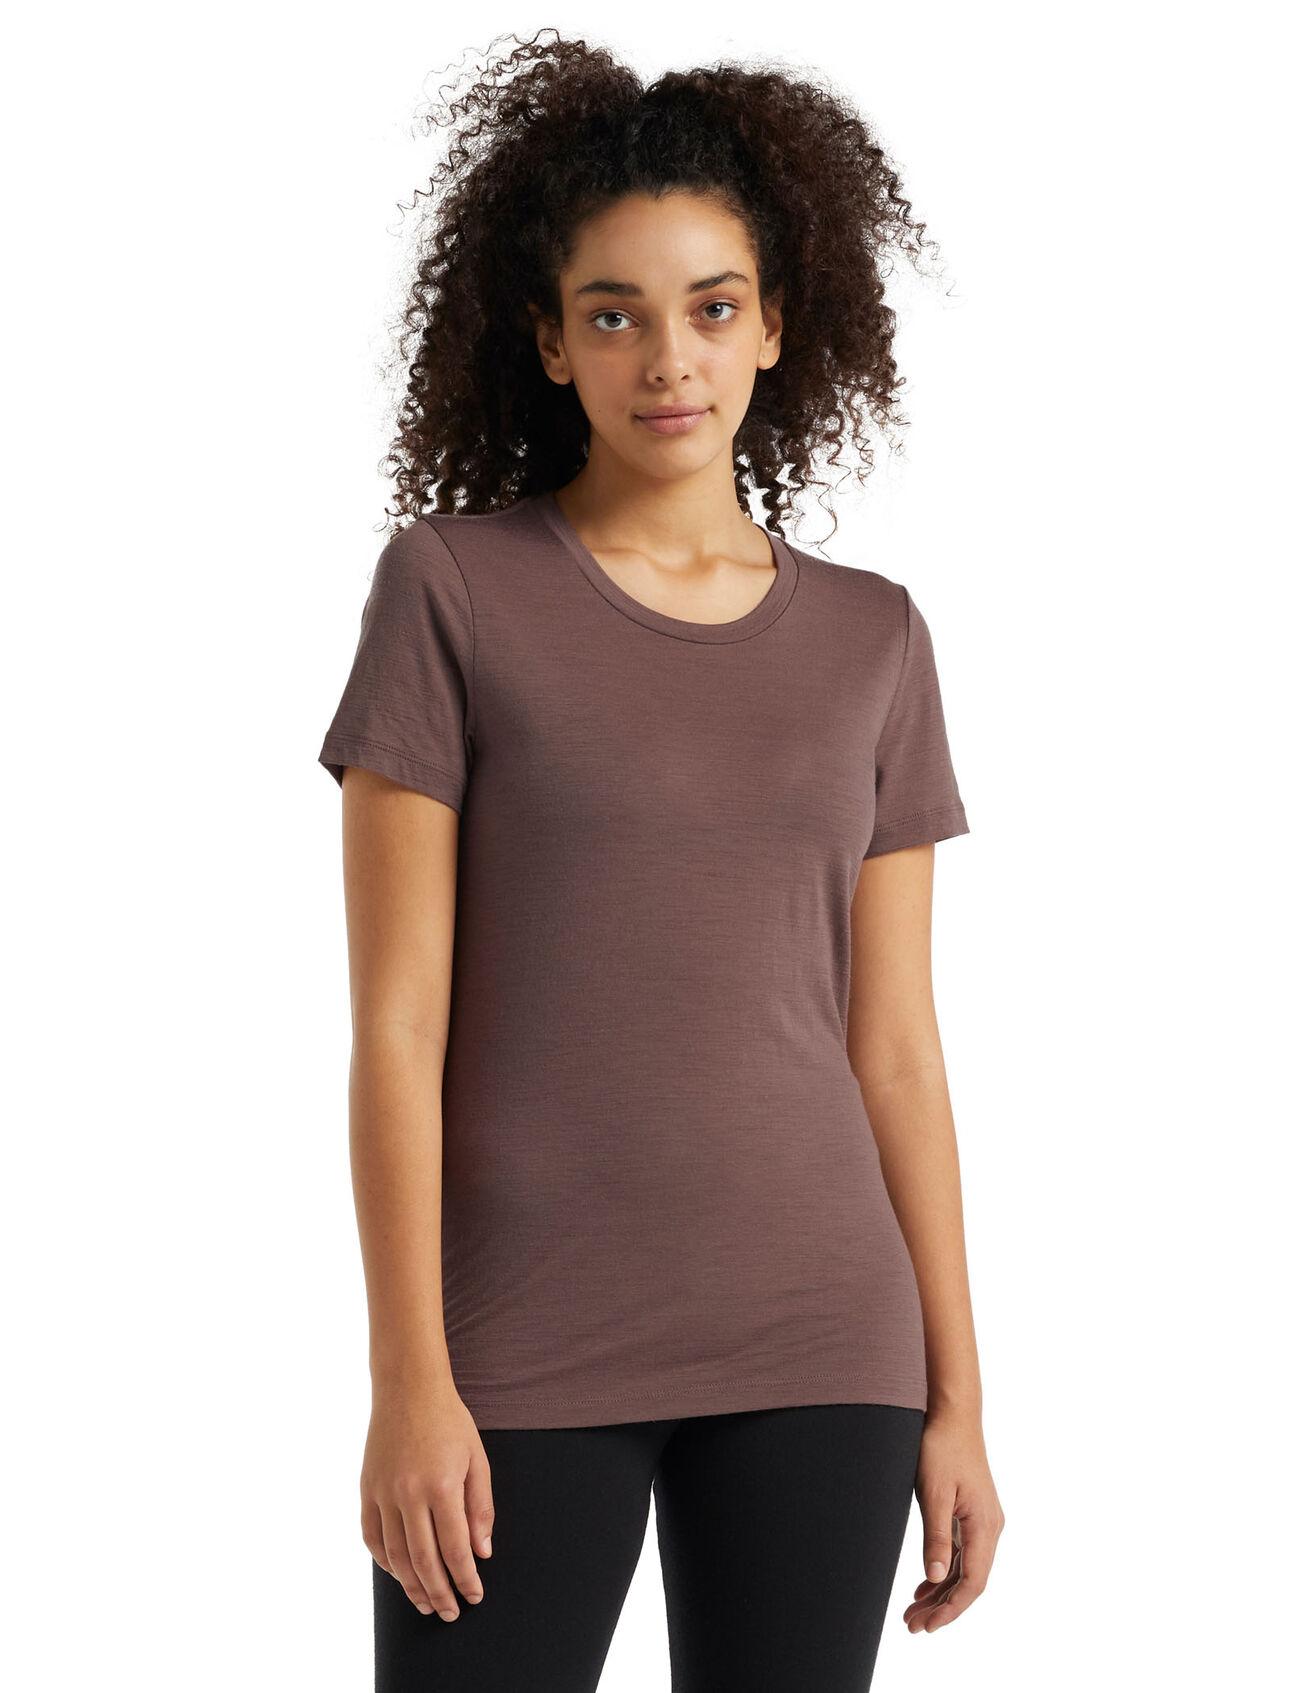 Merino Tech Lite II Short Sleeve T-Shirt